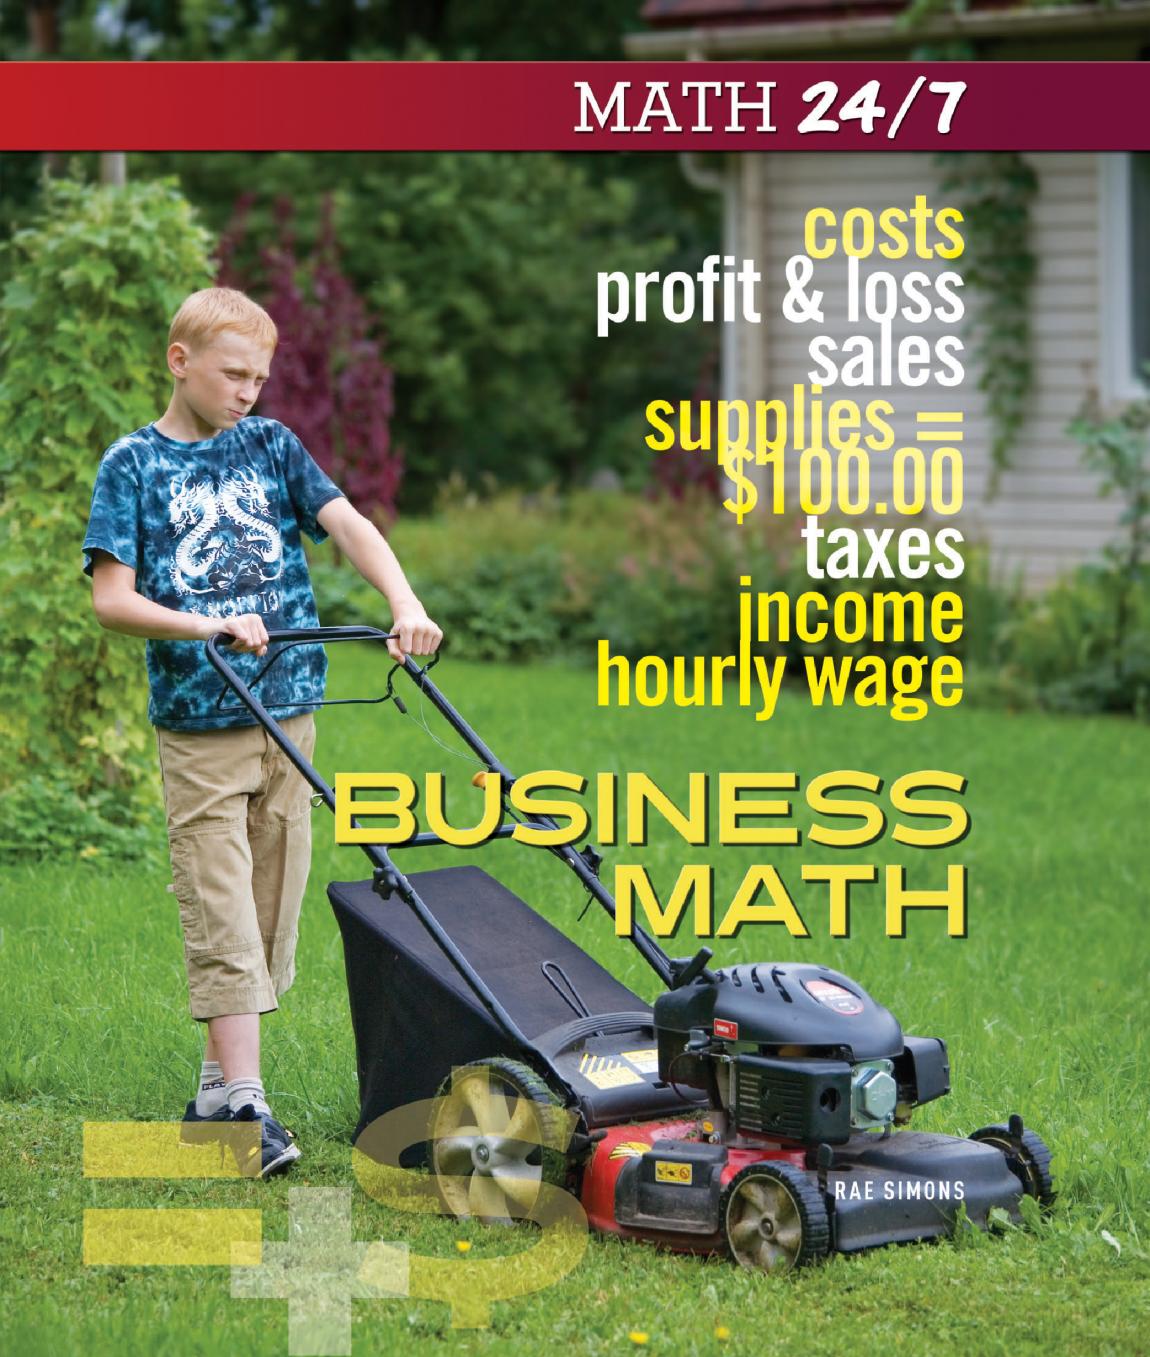 business-math-01.png